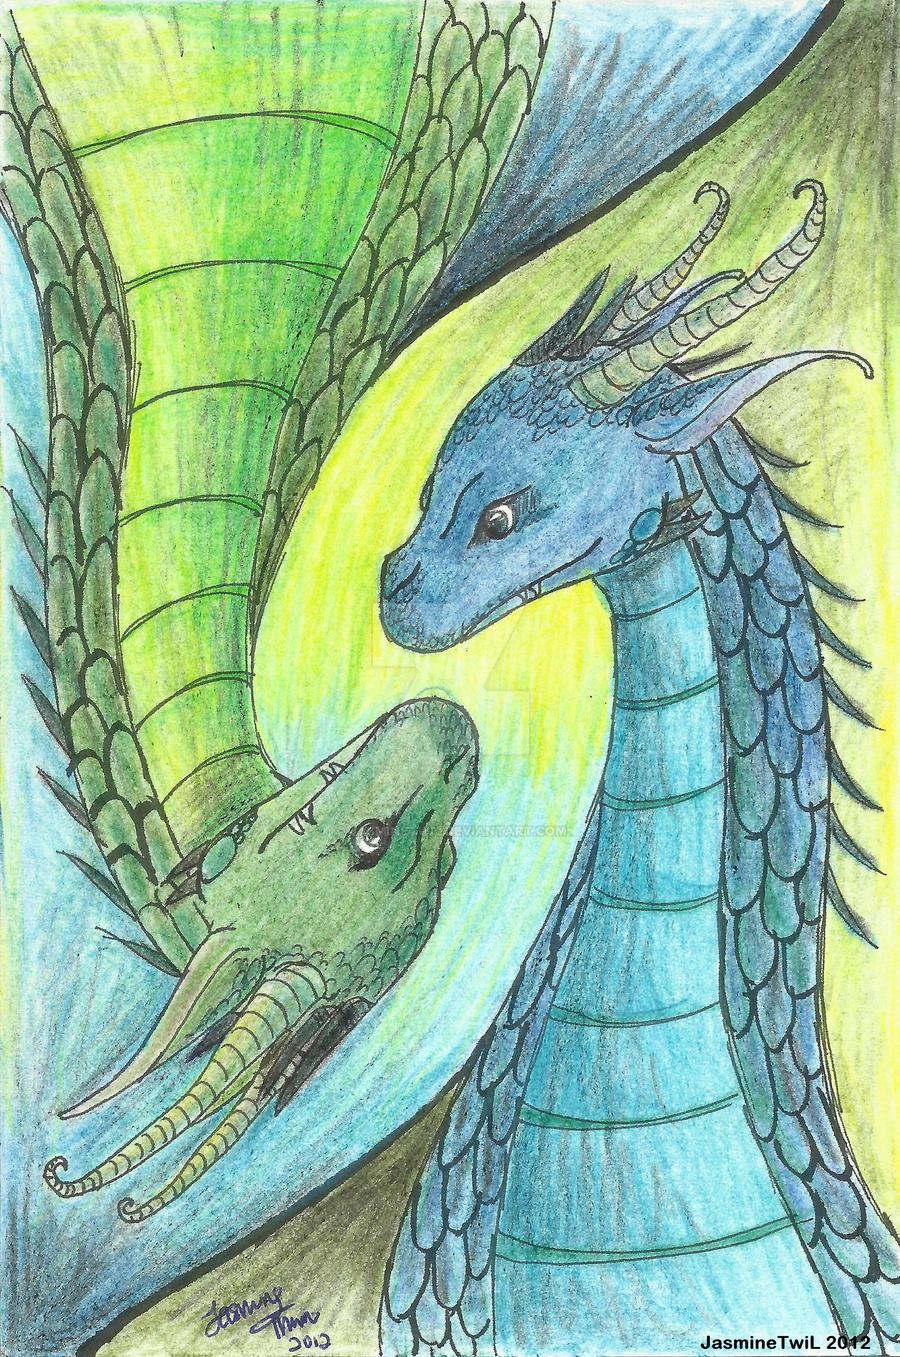 Saphira And Firnen By JasmineTwiL On DeviantArt